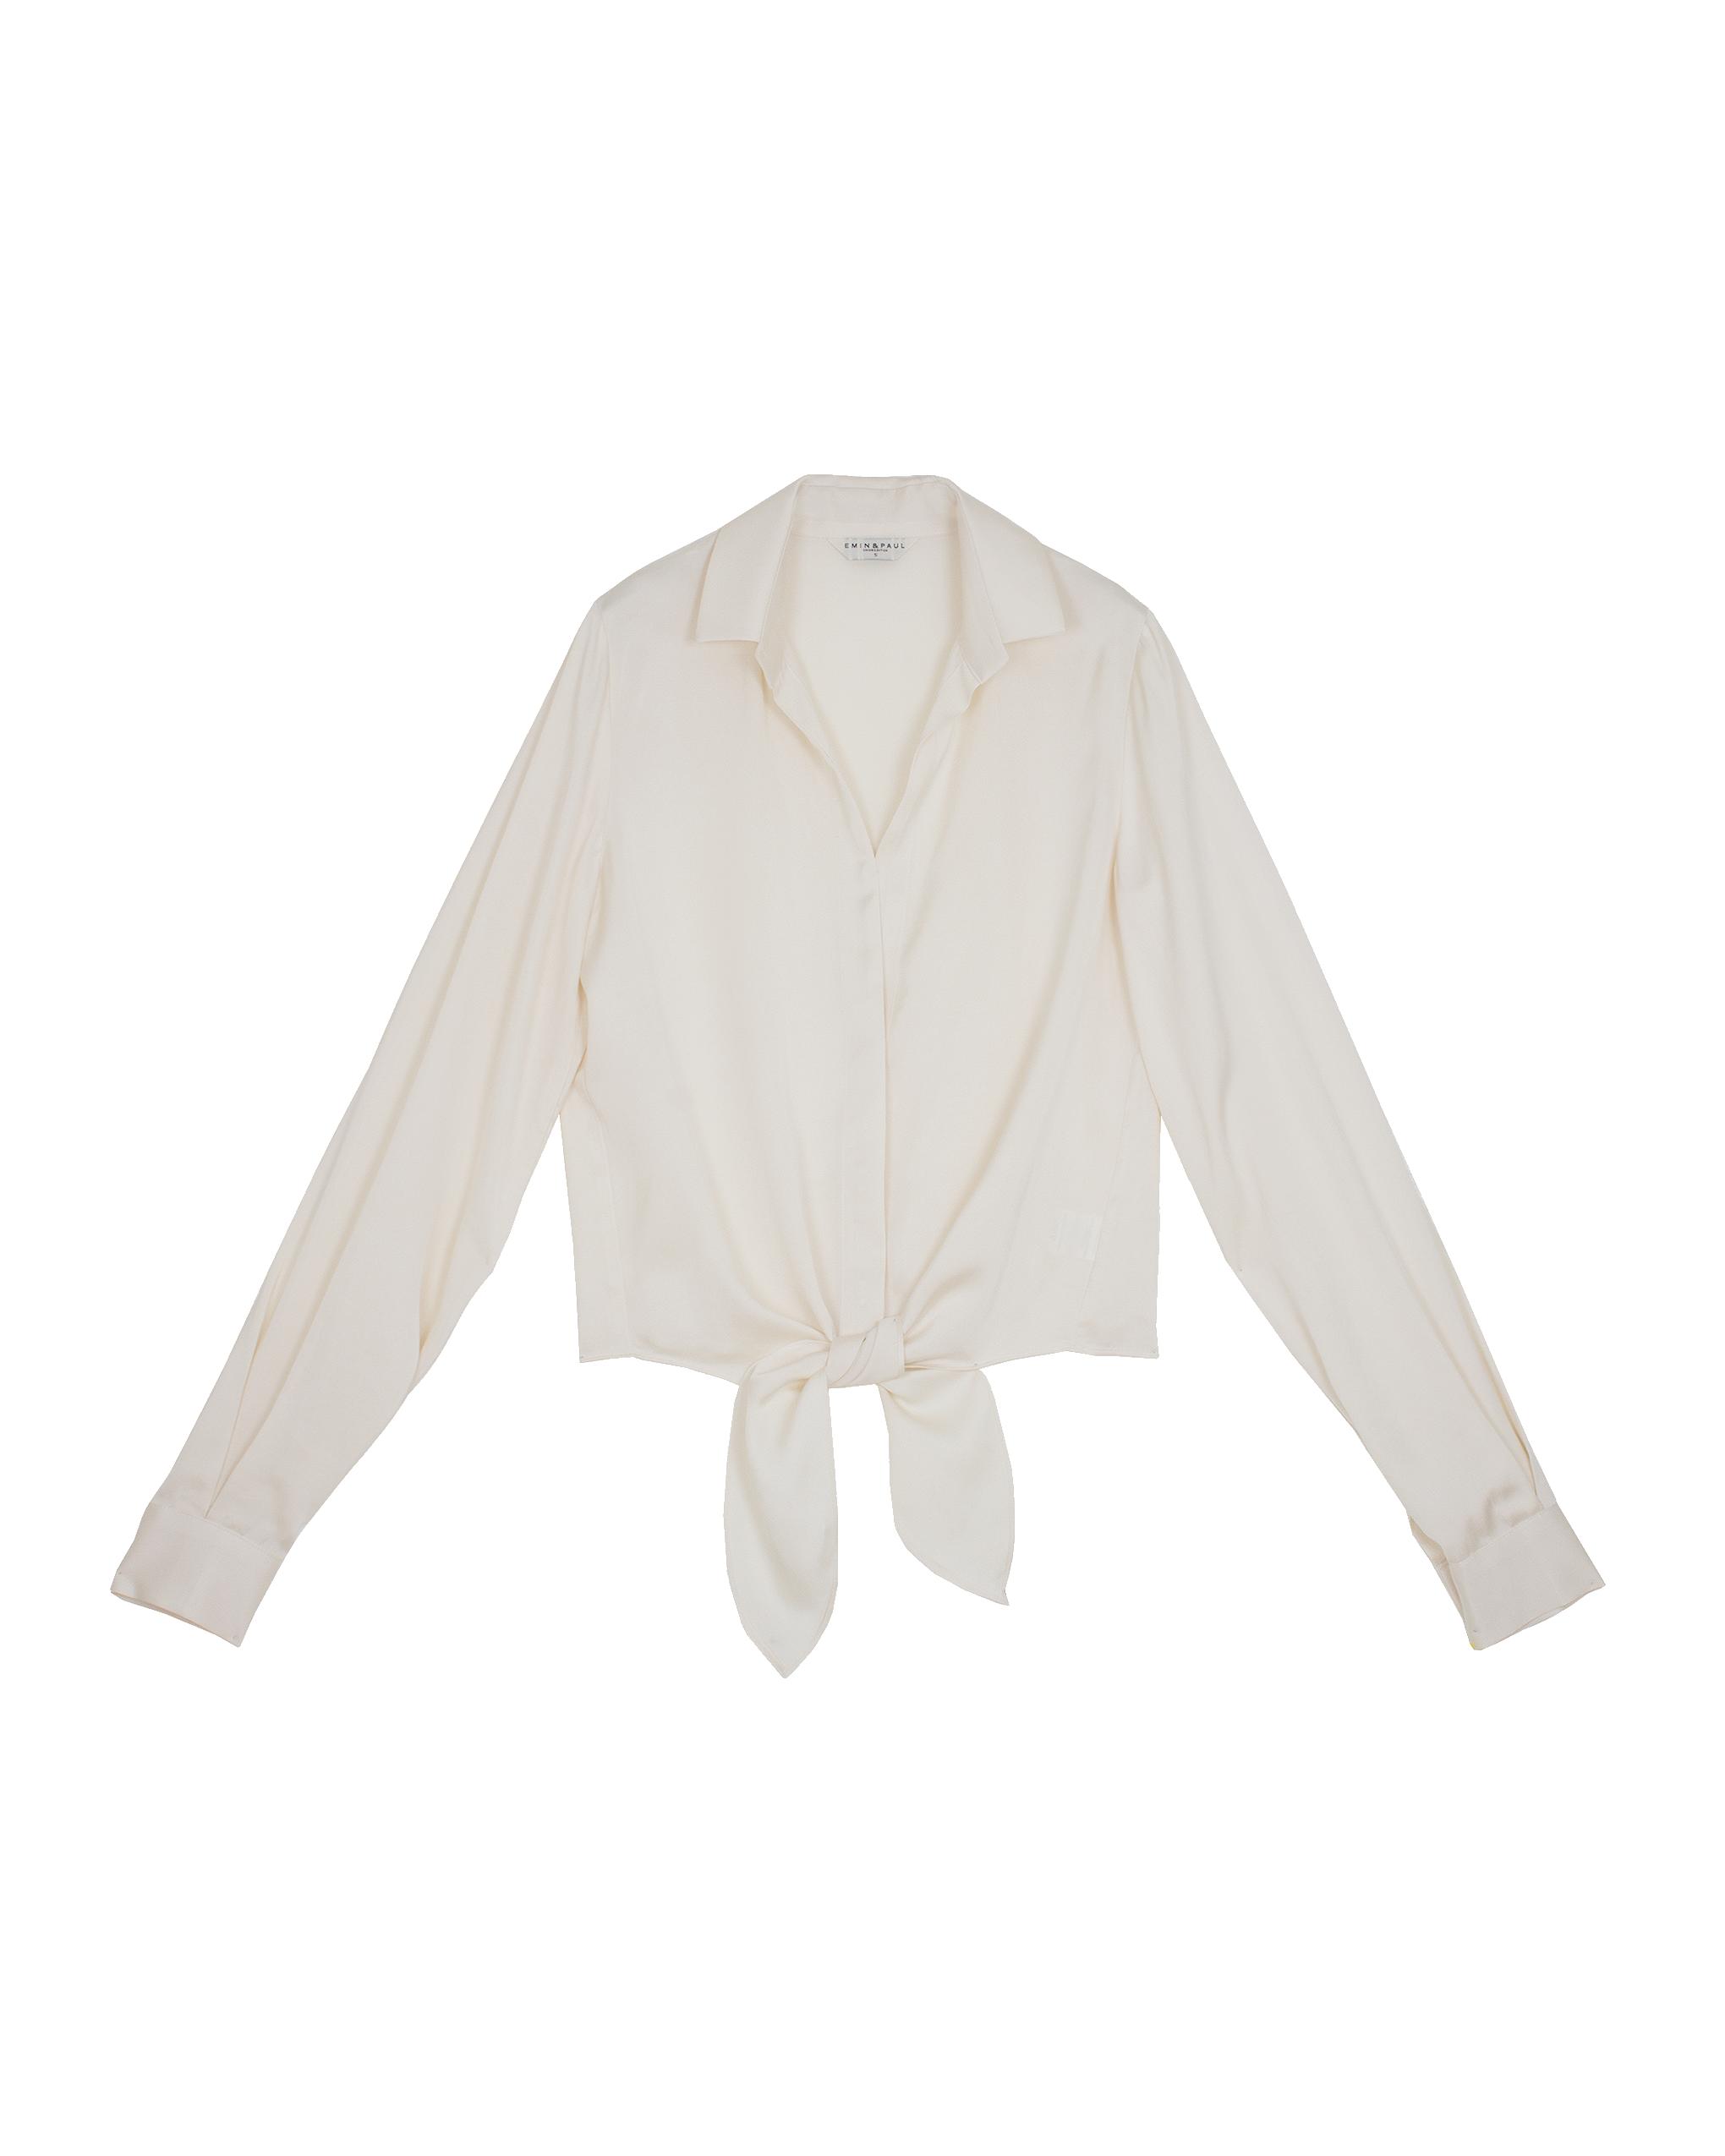 EMIN + PAUL cream tie-front blouse.